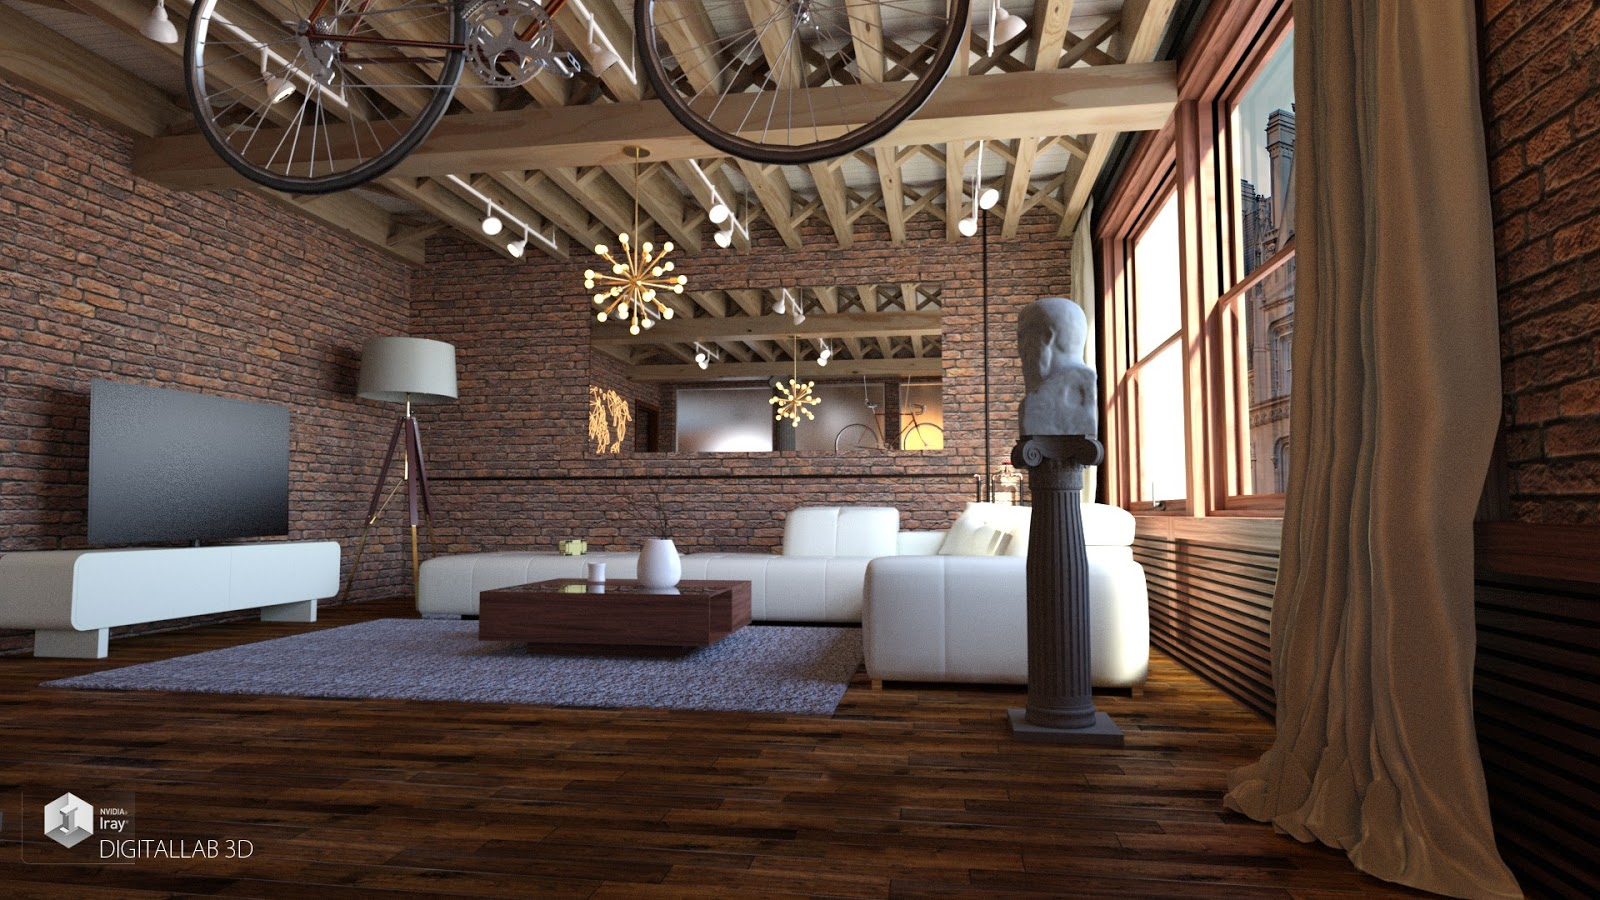 Download daz studio 3 for free daz 3d ny living room for Living room 2 for daz studio